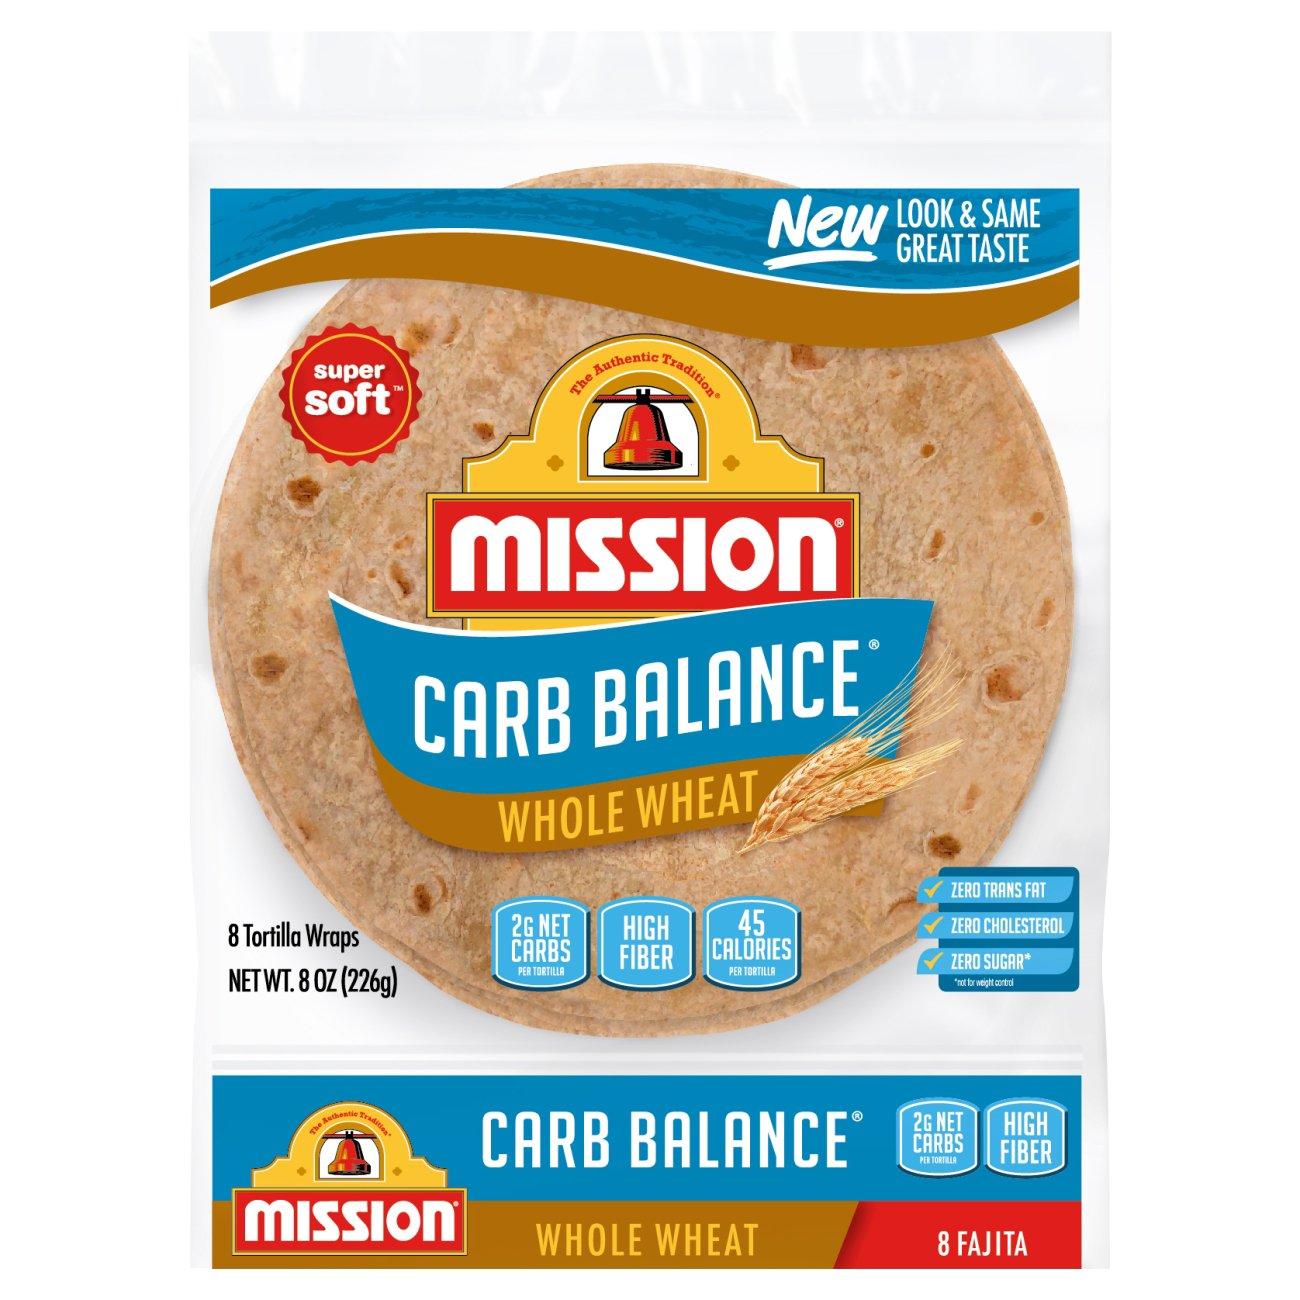 Mission Carb Balance Small Fajita Whole Wheat Tortillas Shop Tortillas At Heb